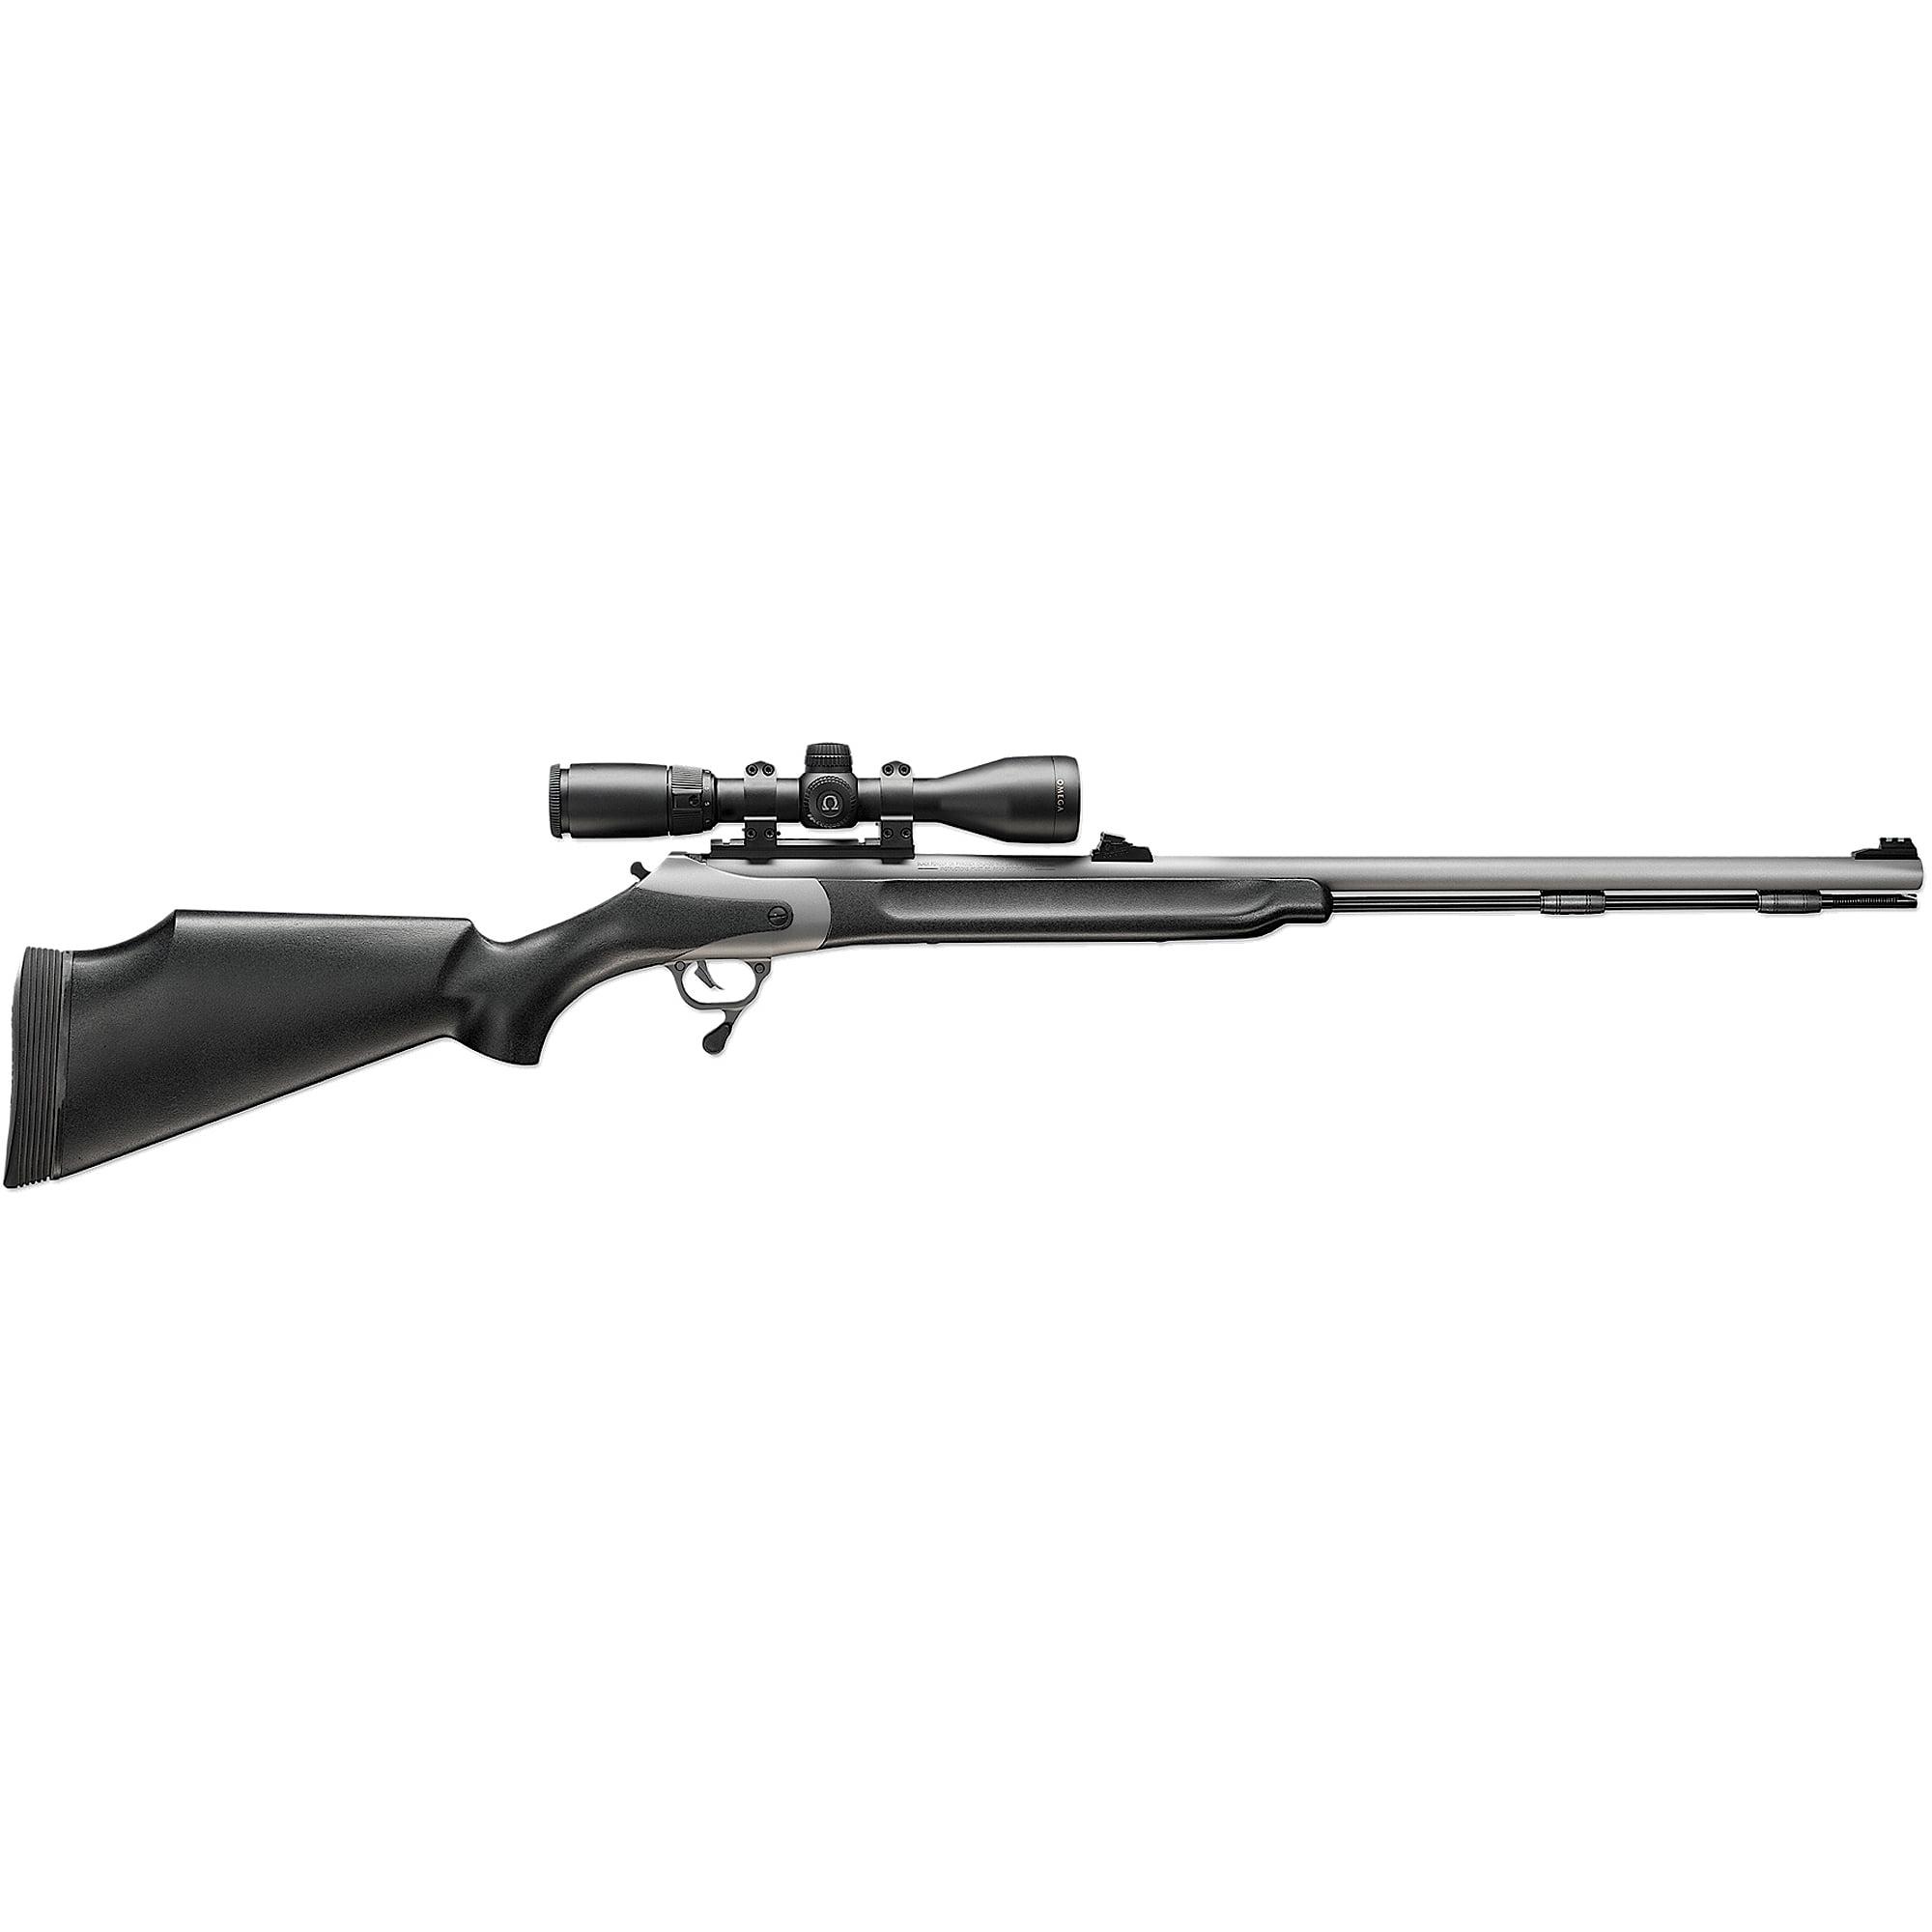 46005 Thompson/Center Arms Triumph Muzzleloader